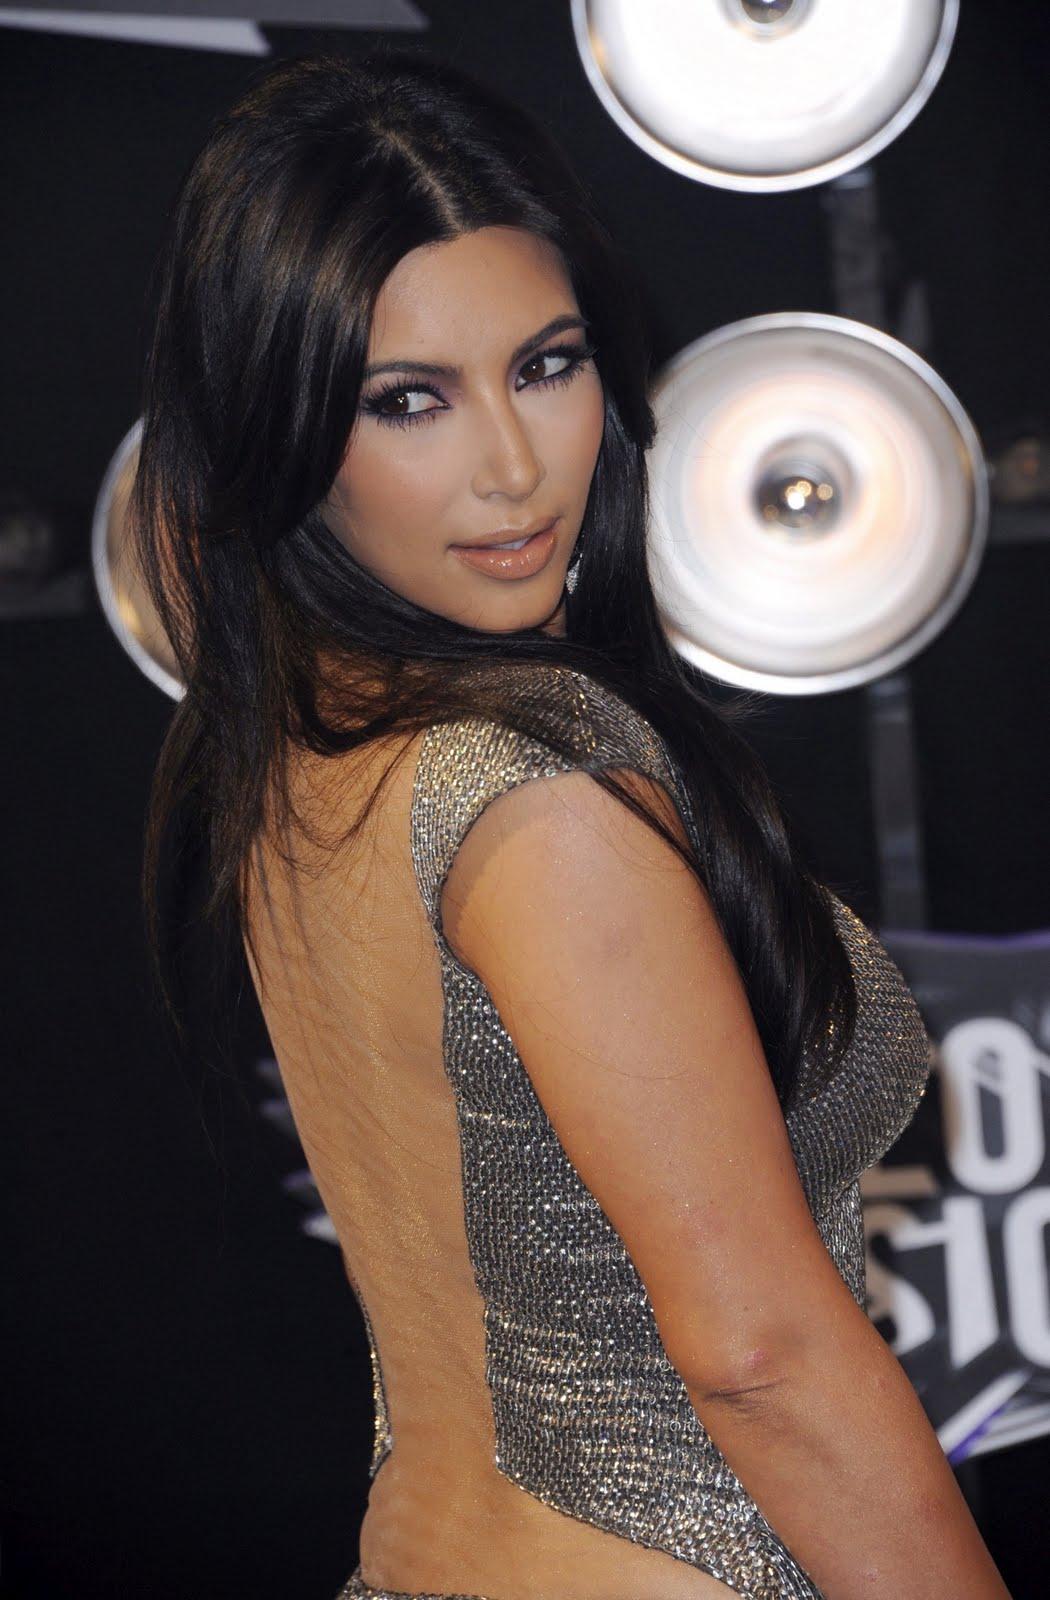 http://2.bp.blogspot.com/-6nIwDrpc8CE/TqQBYocZseI/AAAAAAAAFTo/KsFdUyarFcc/s1600/Kim-Kardashian-55.jpg